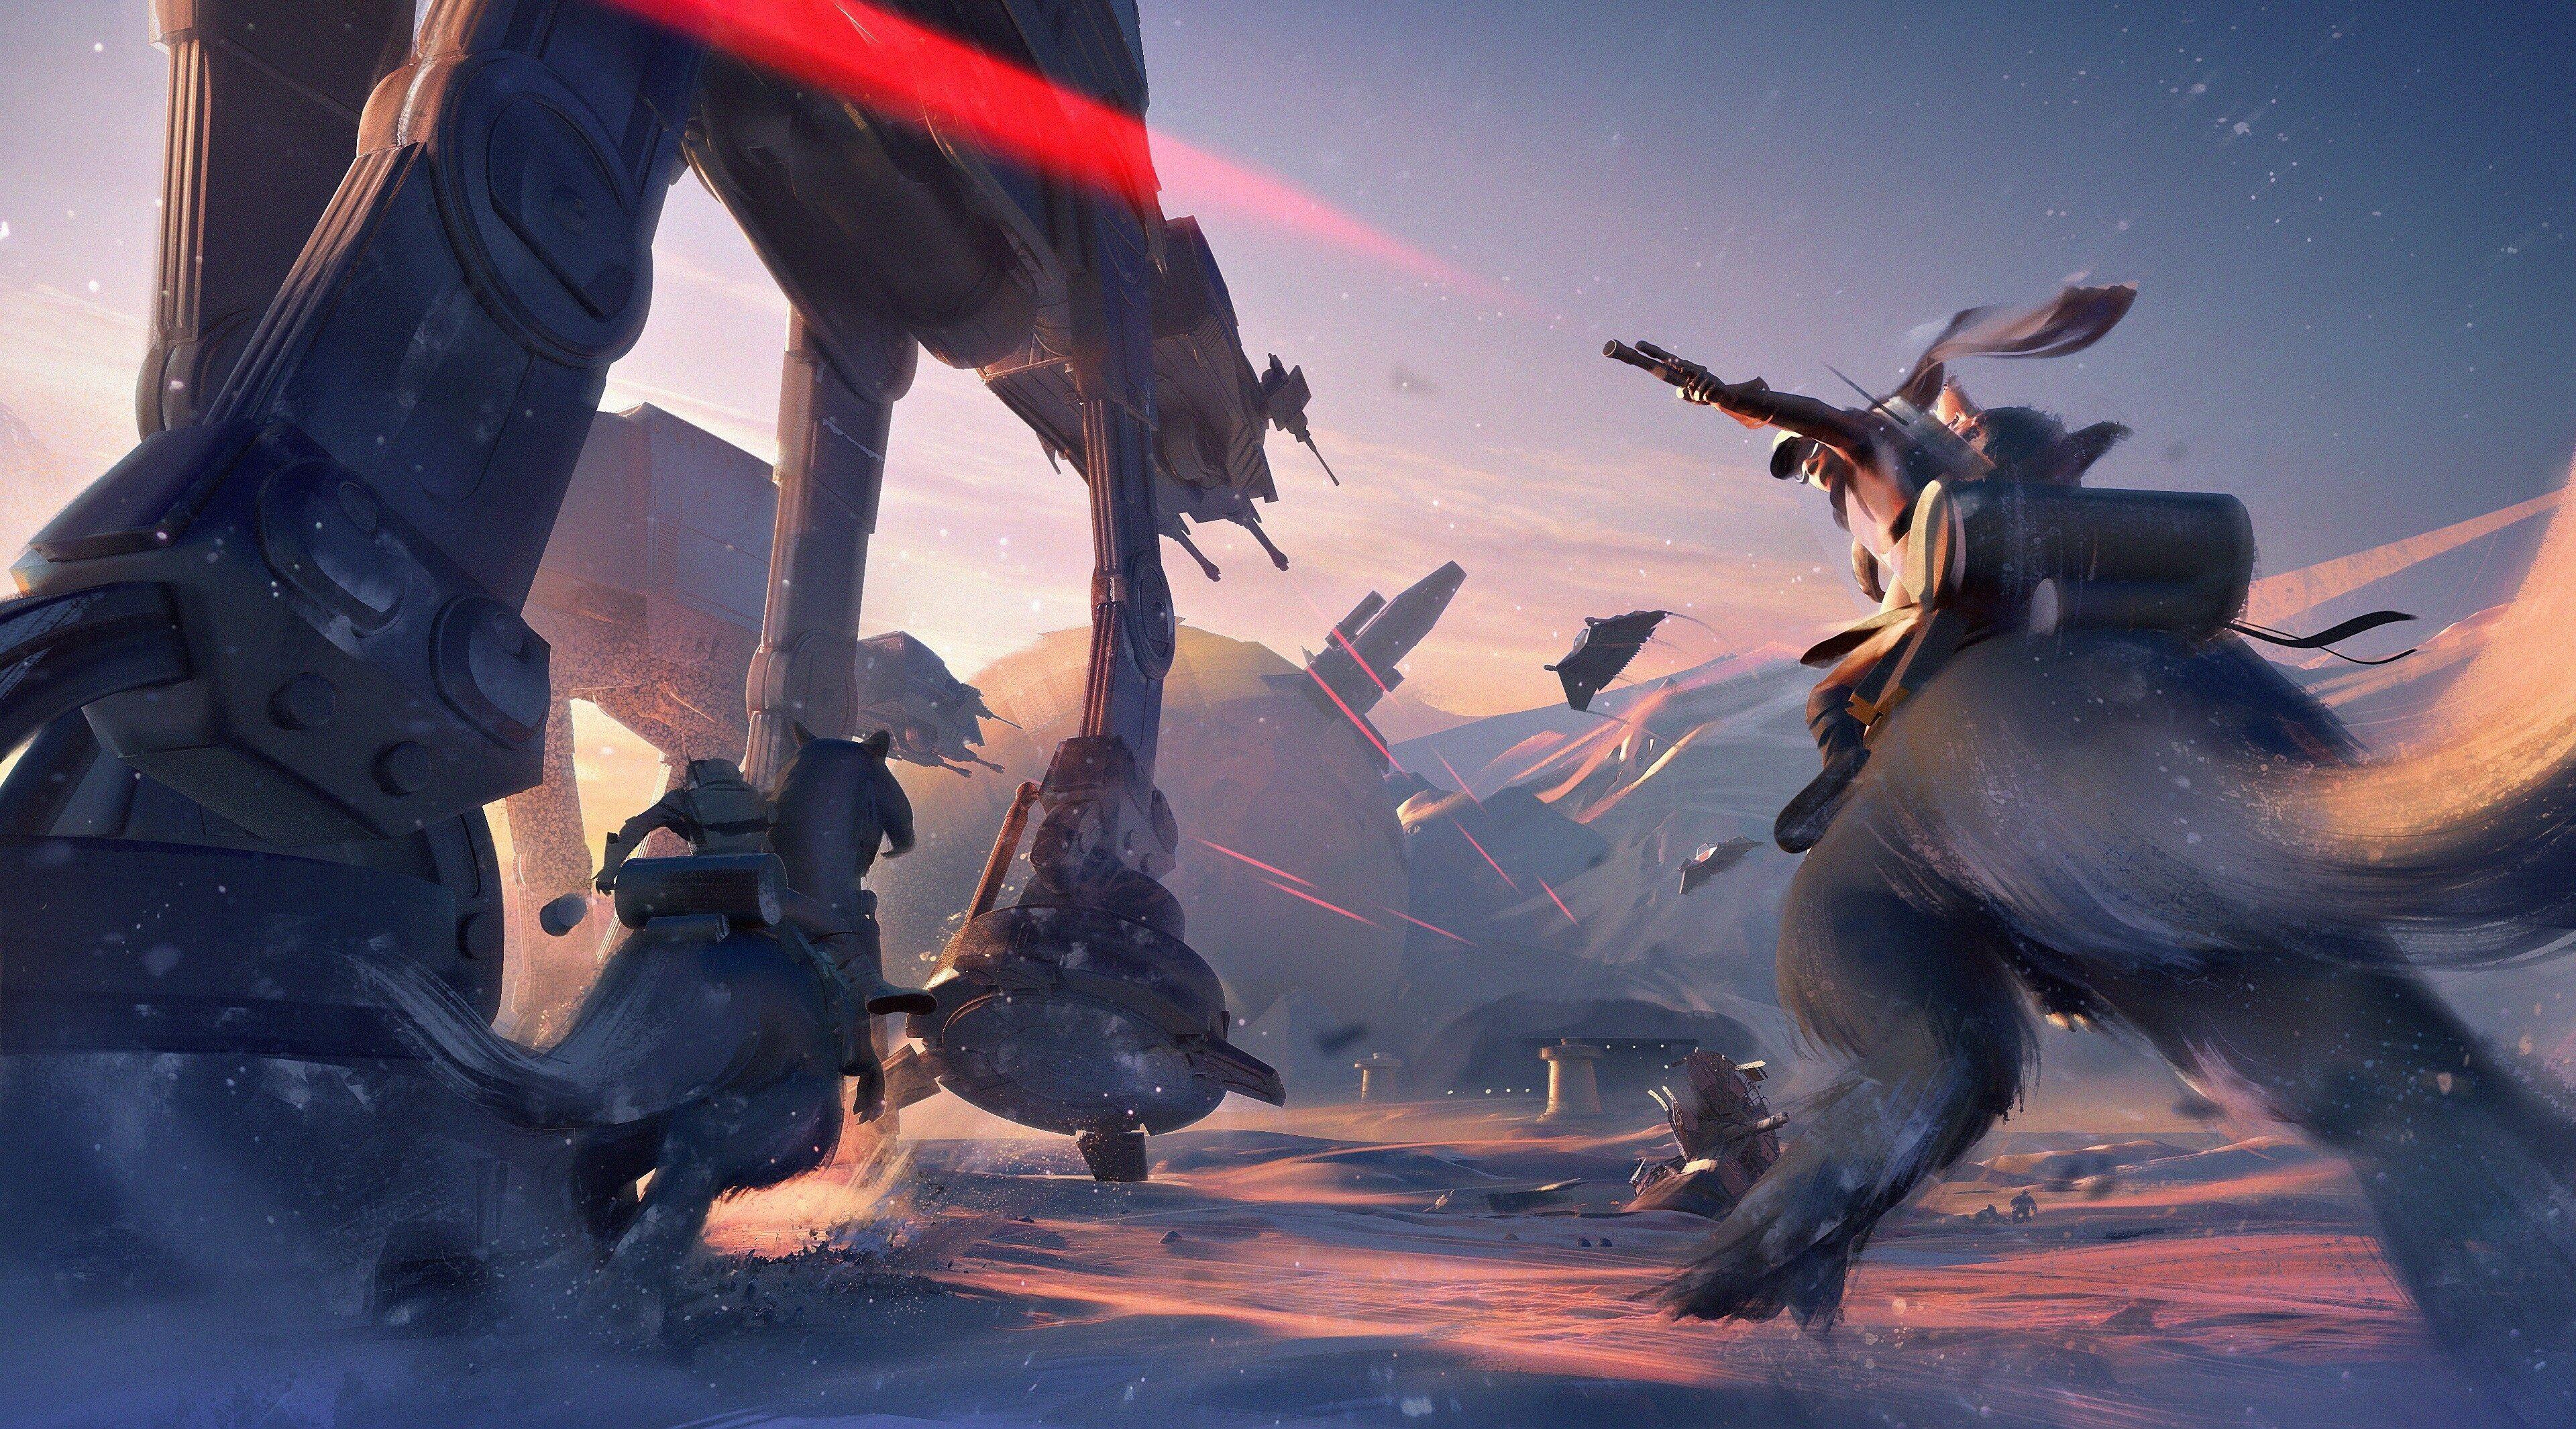 Star Wars Battlefront 2 Celebration Edition Wallpaper Hd